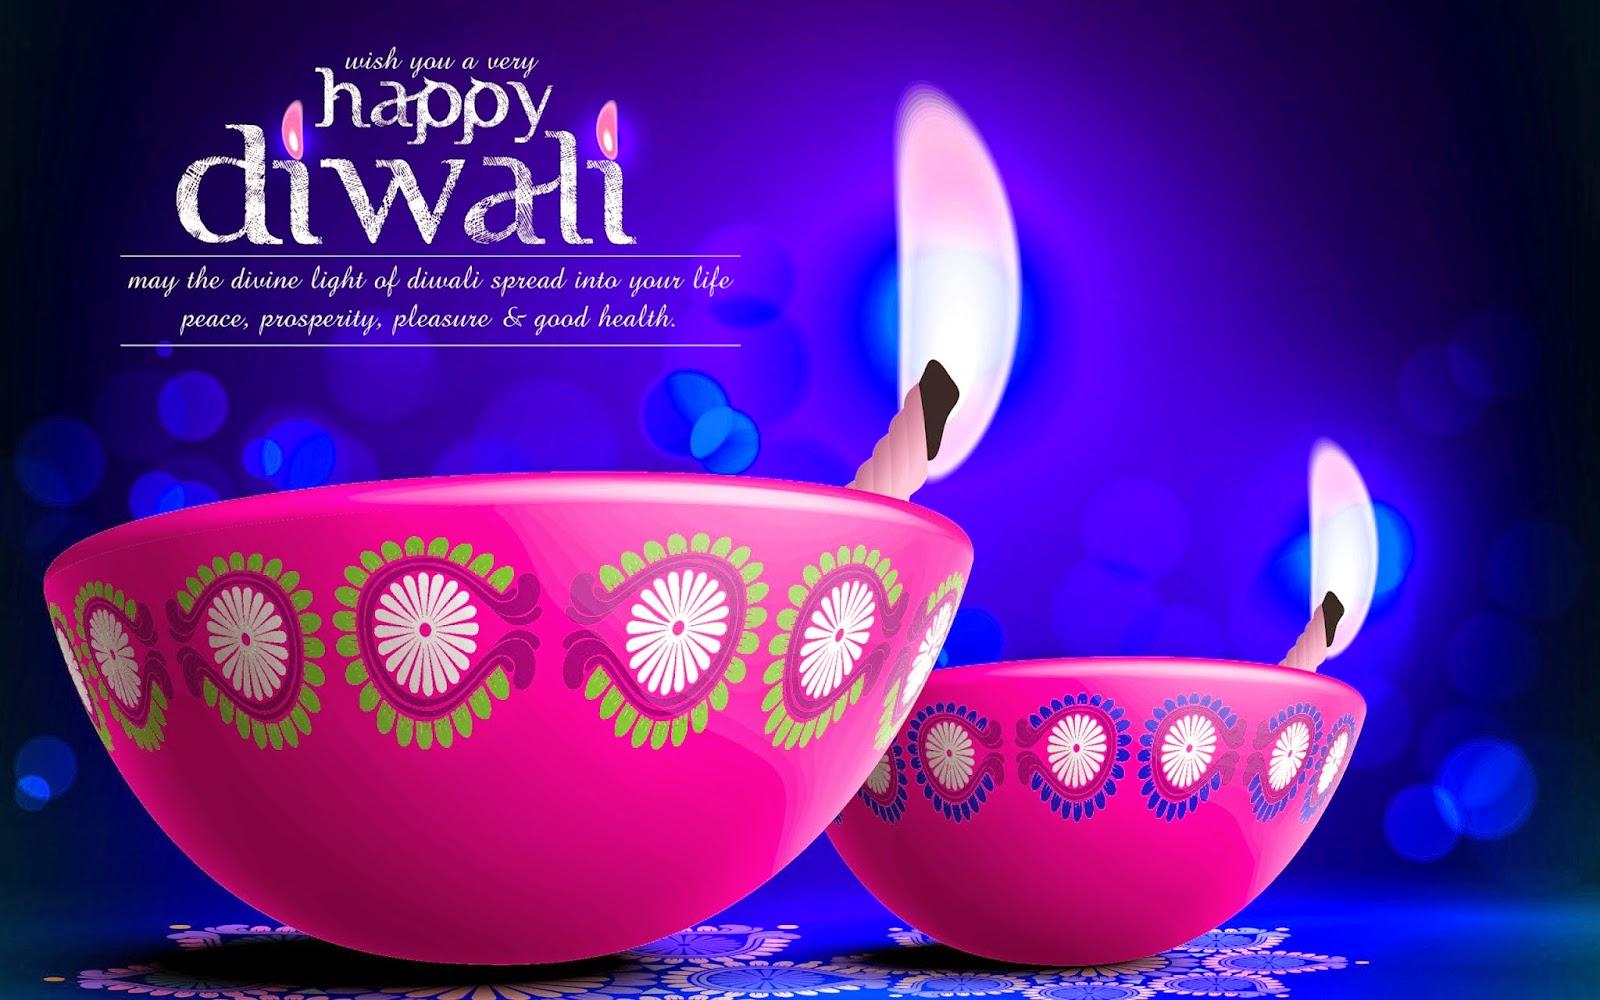 Happy Choti Diwali 2016 Images